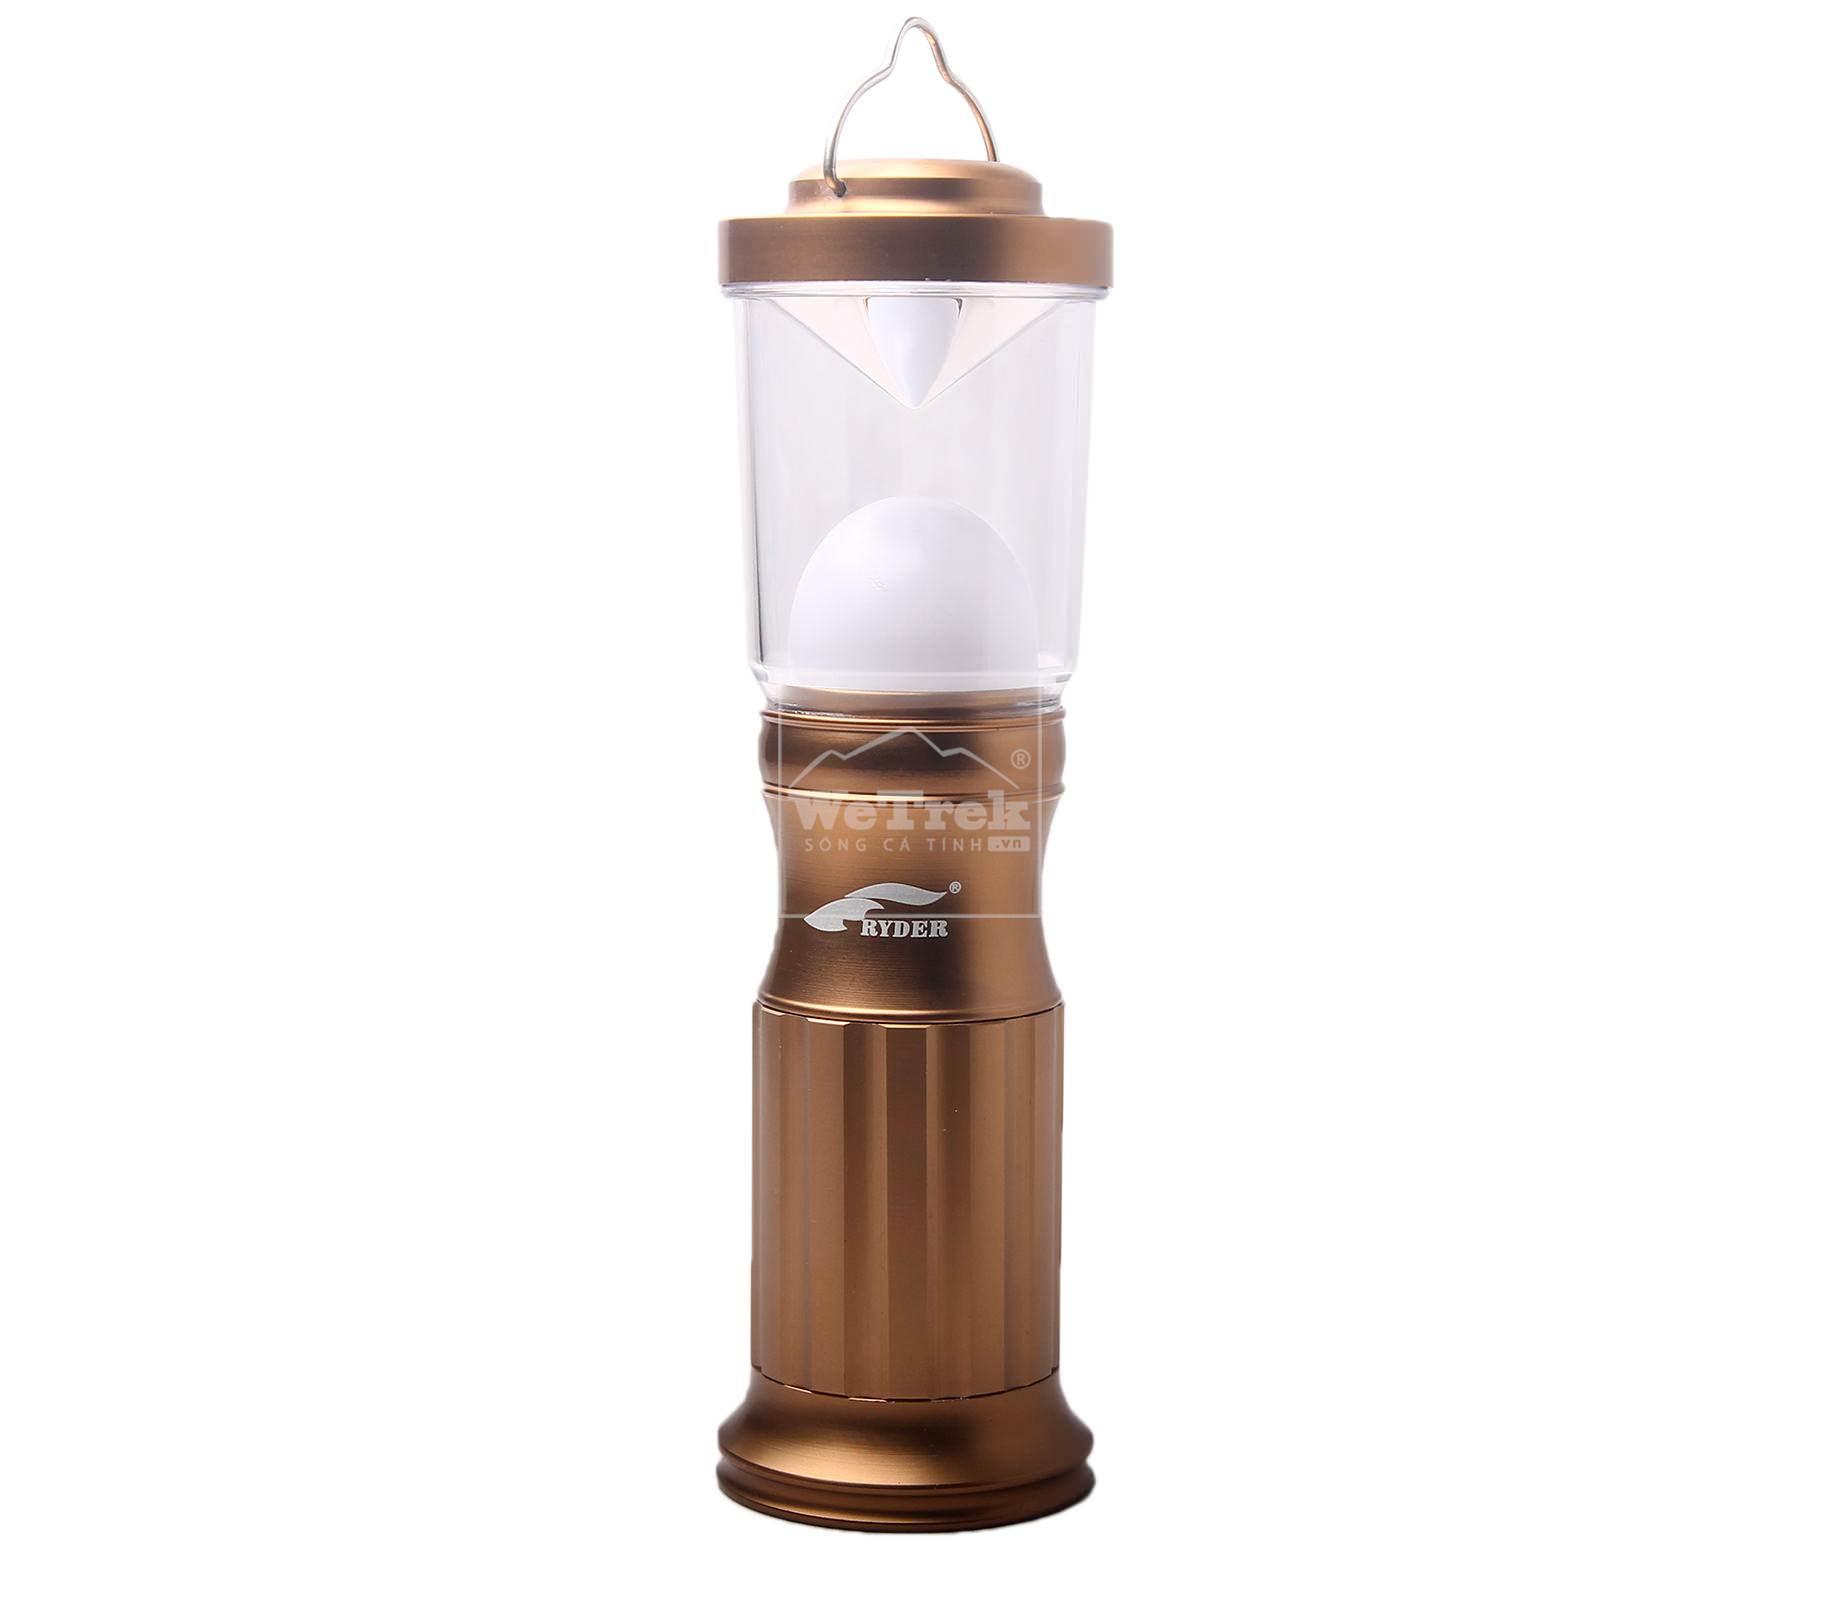 Đèn lều 16 LED Ryder Alloy Lantern K2002 - 1200